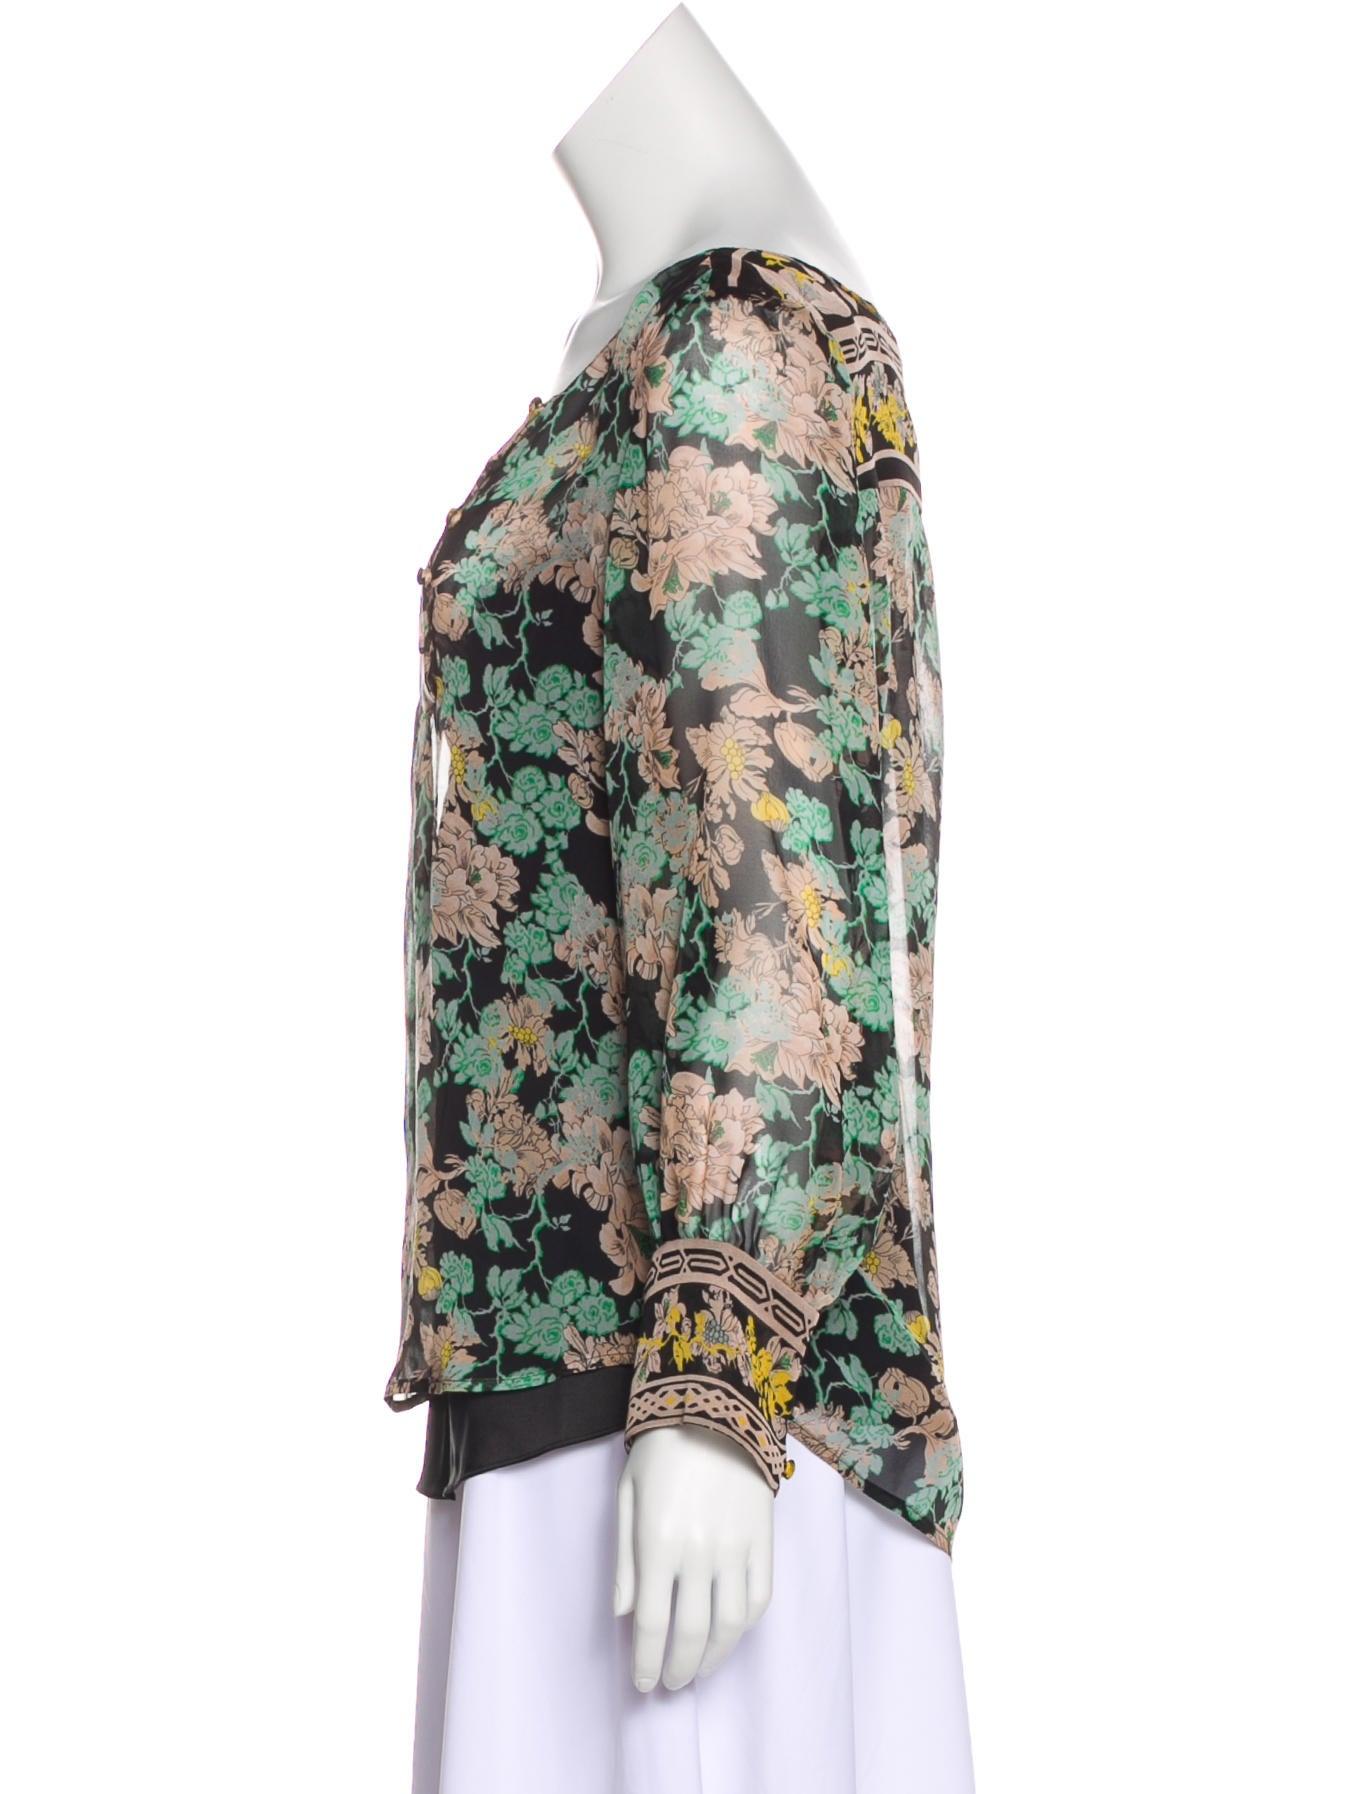 Diane Von Furstenberg Laos Silk Floral Blouse Clothing Wdi130457